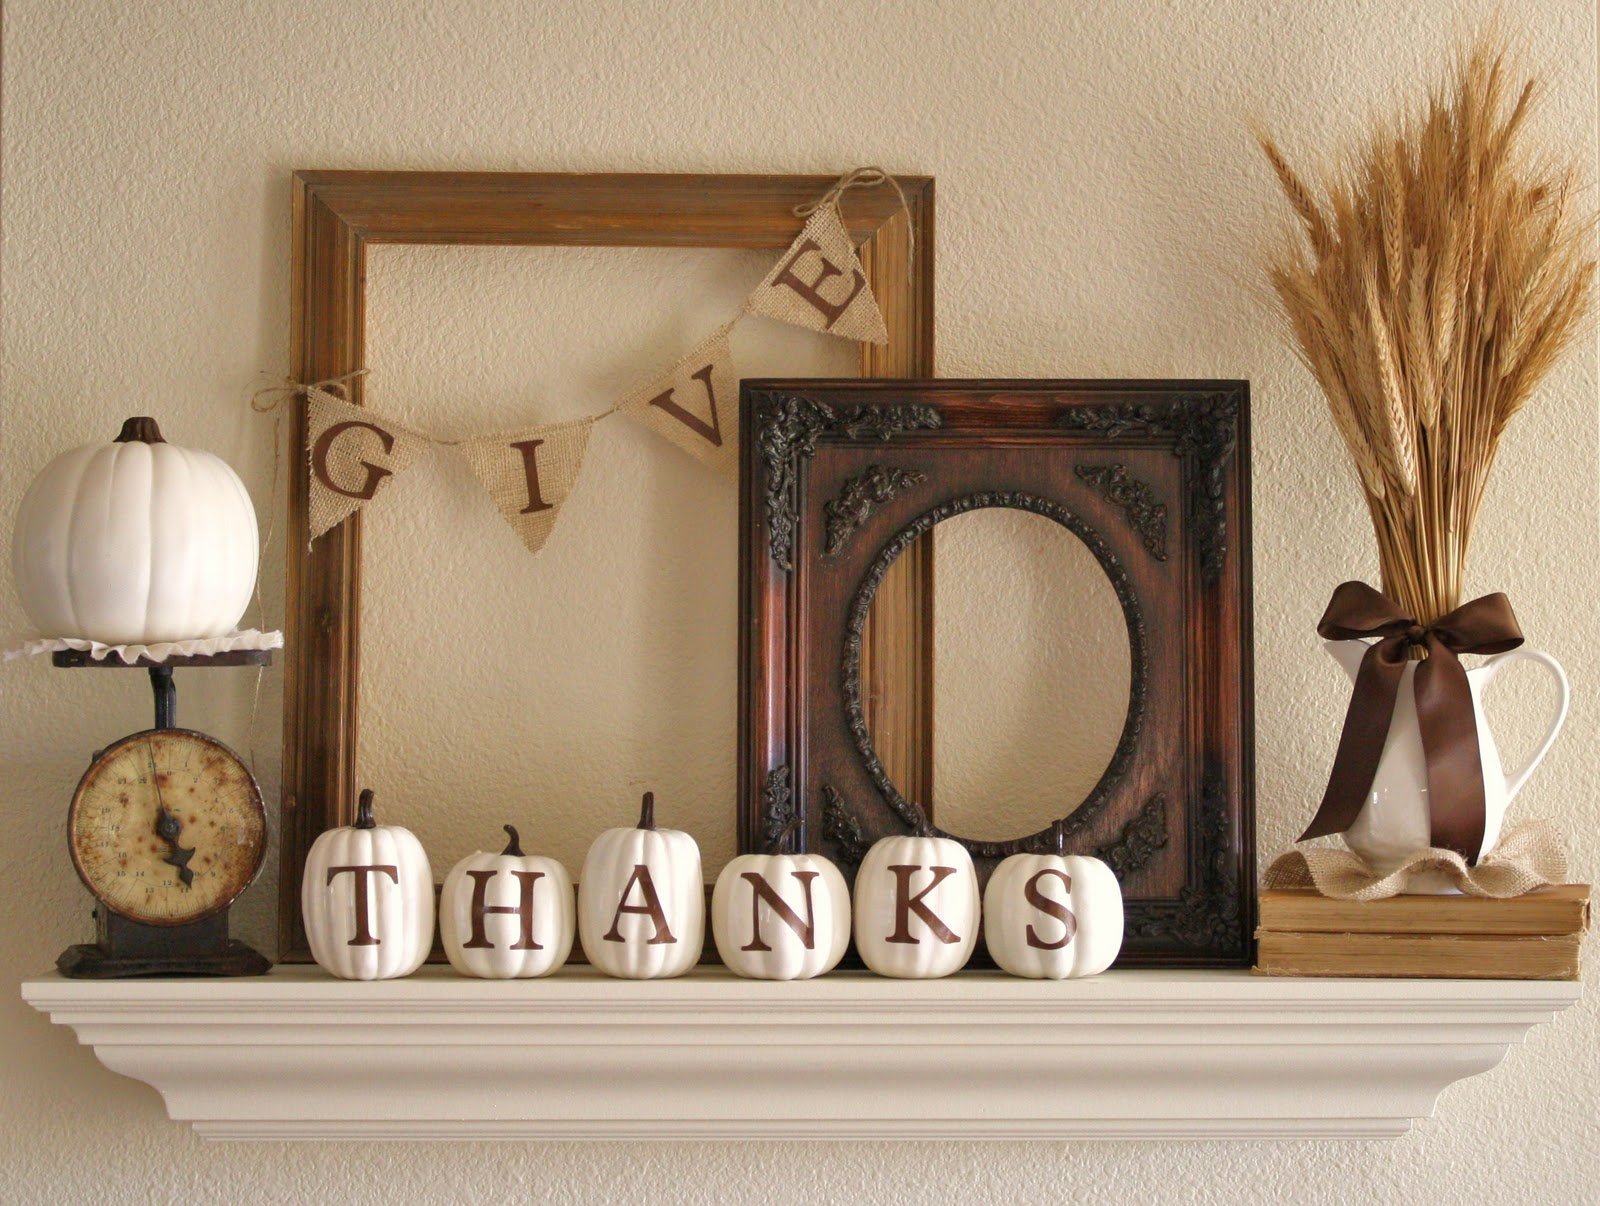 Living Room Diy Home Designs diy home design homesfeed pumkins crafts clock frames vase